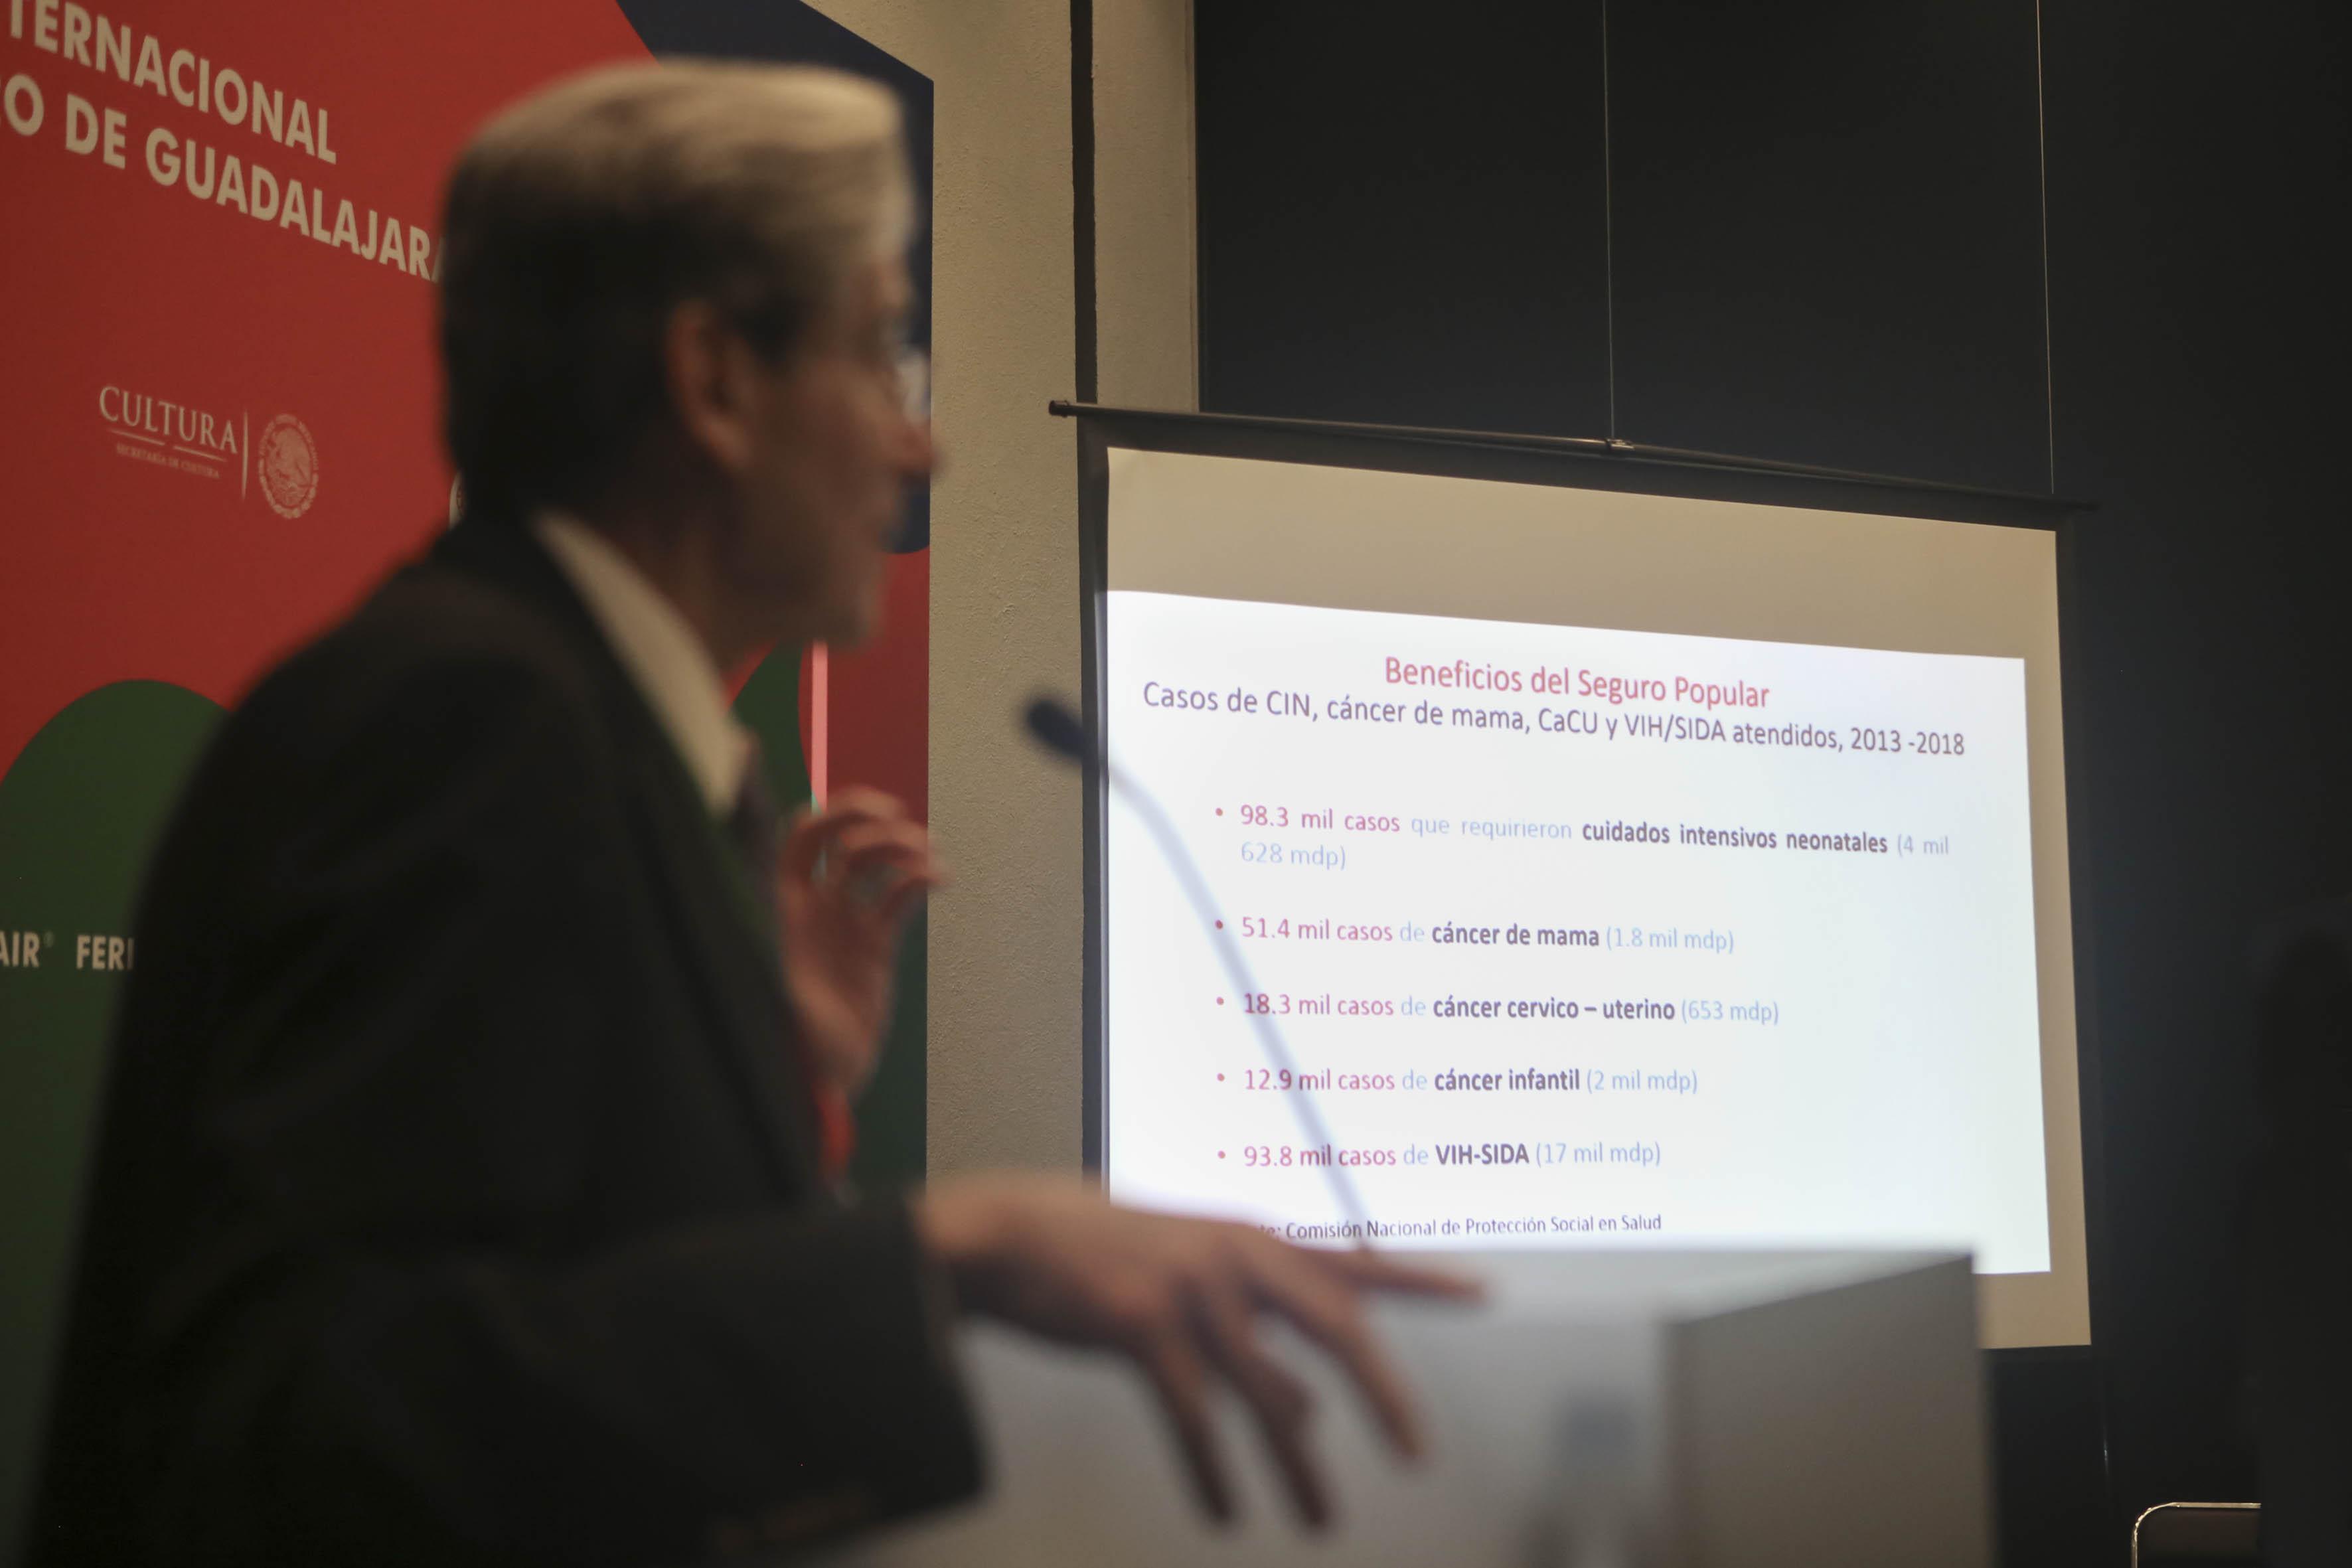 Dr. Julio Frenk, impartiendo conferencia en FIL. Al fondo una diapositiva